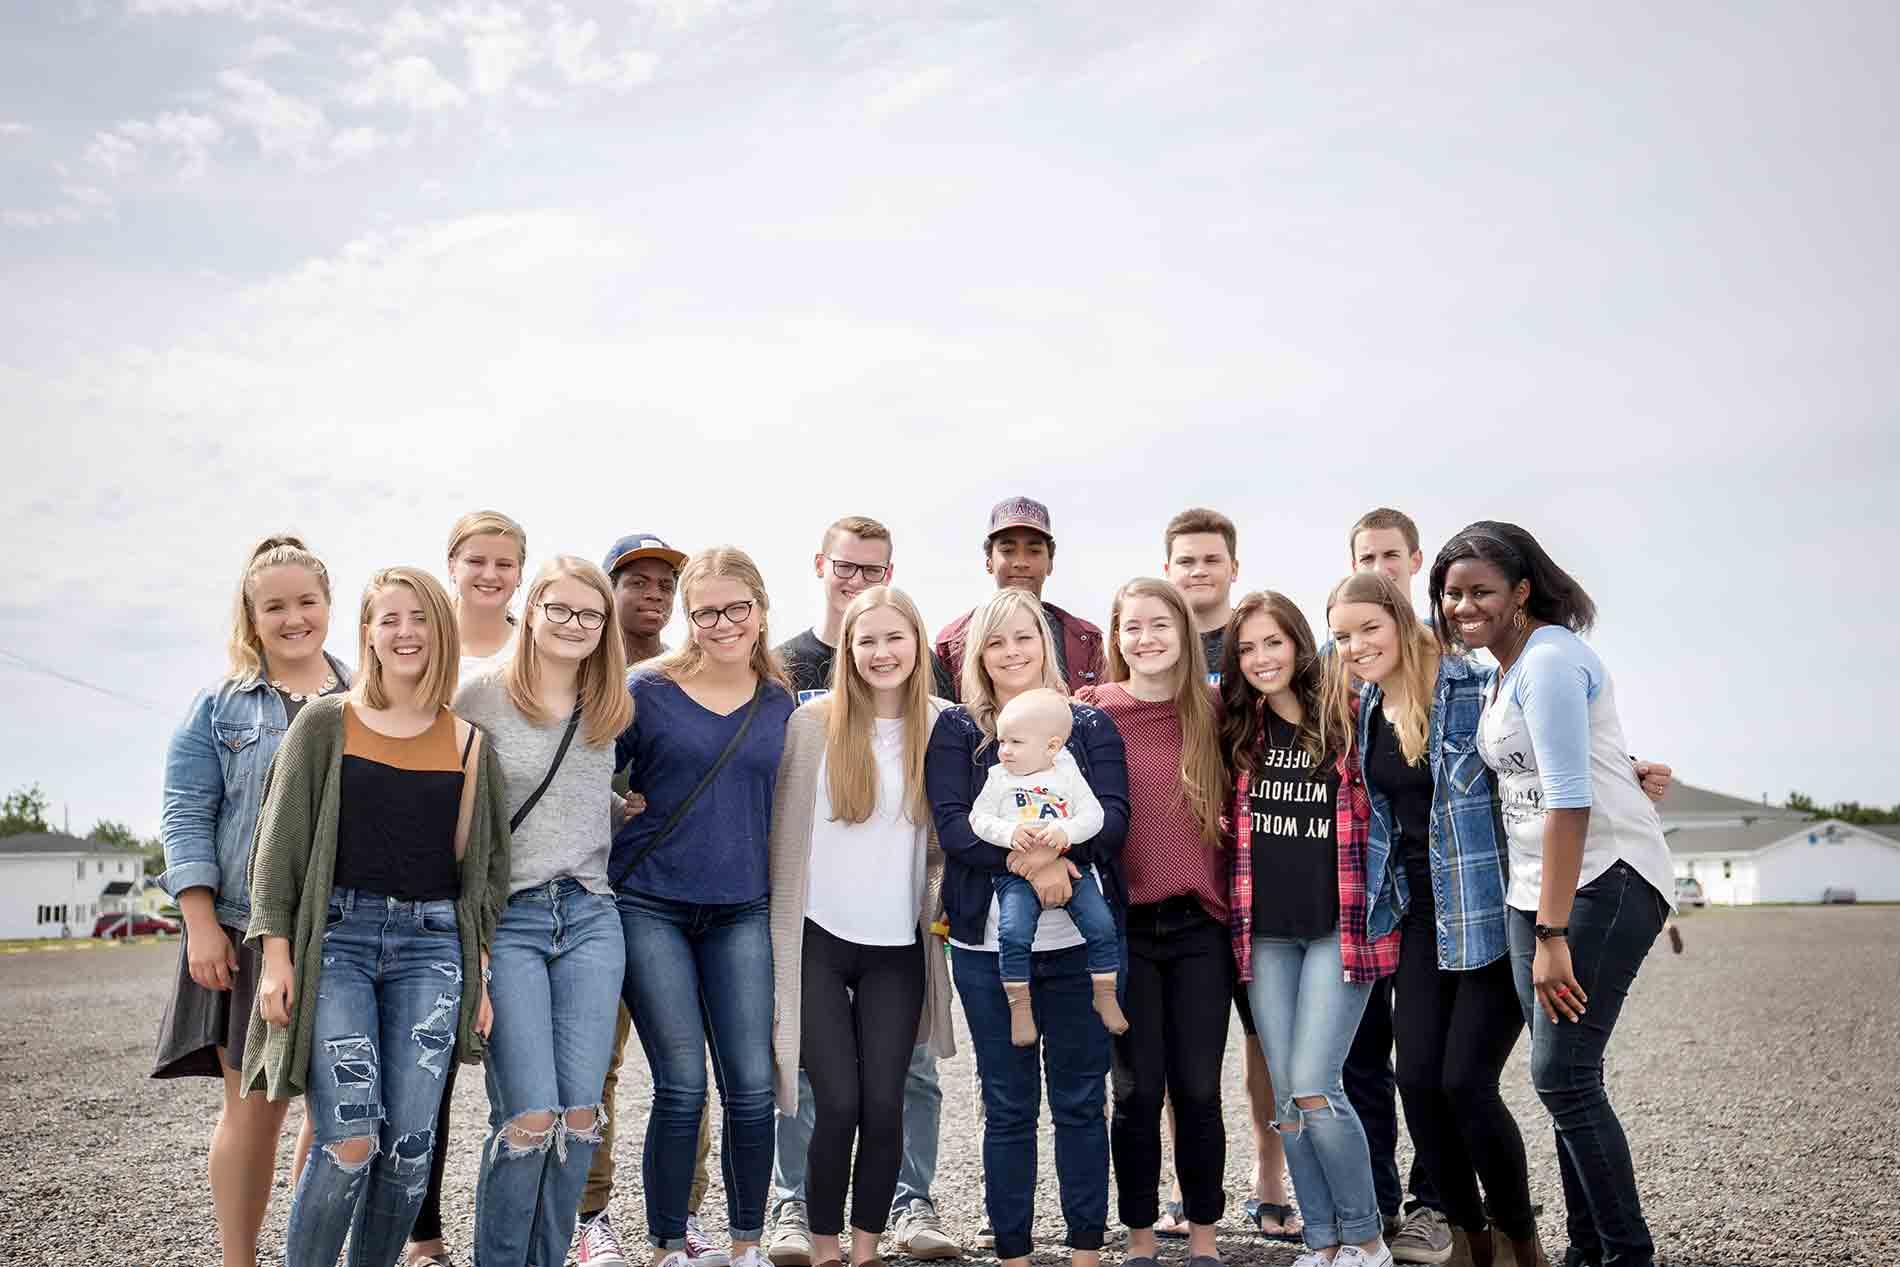 Youth_Lytehouse_Student_Leadership.jpg